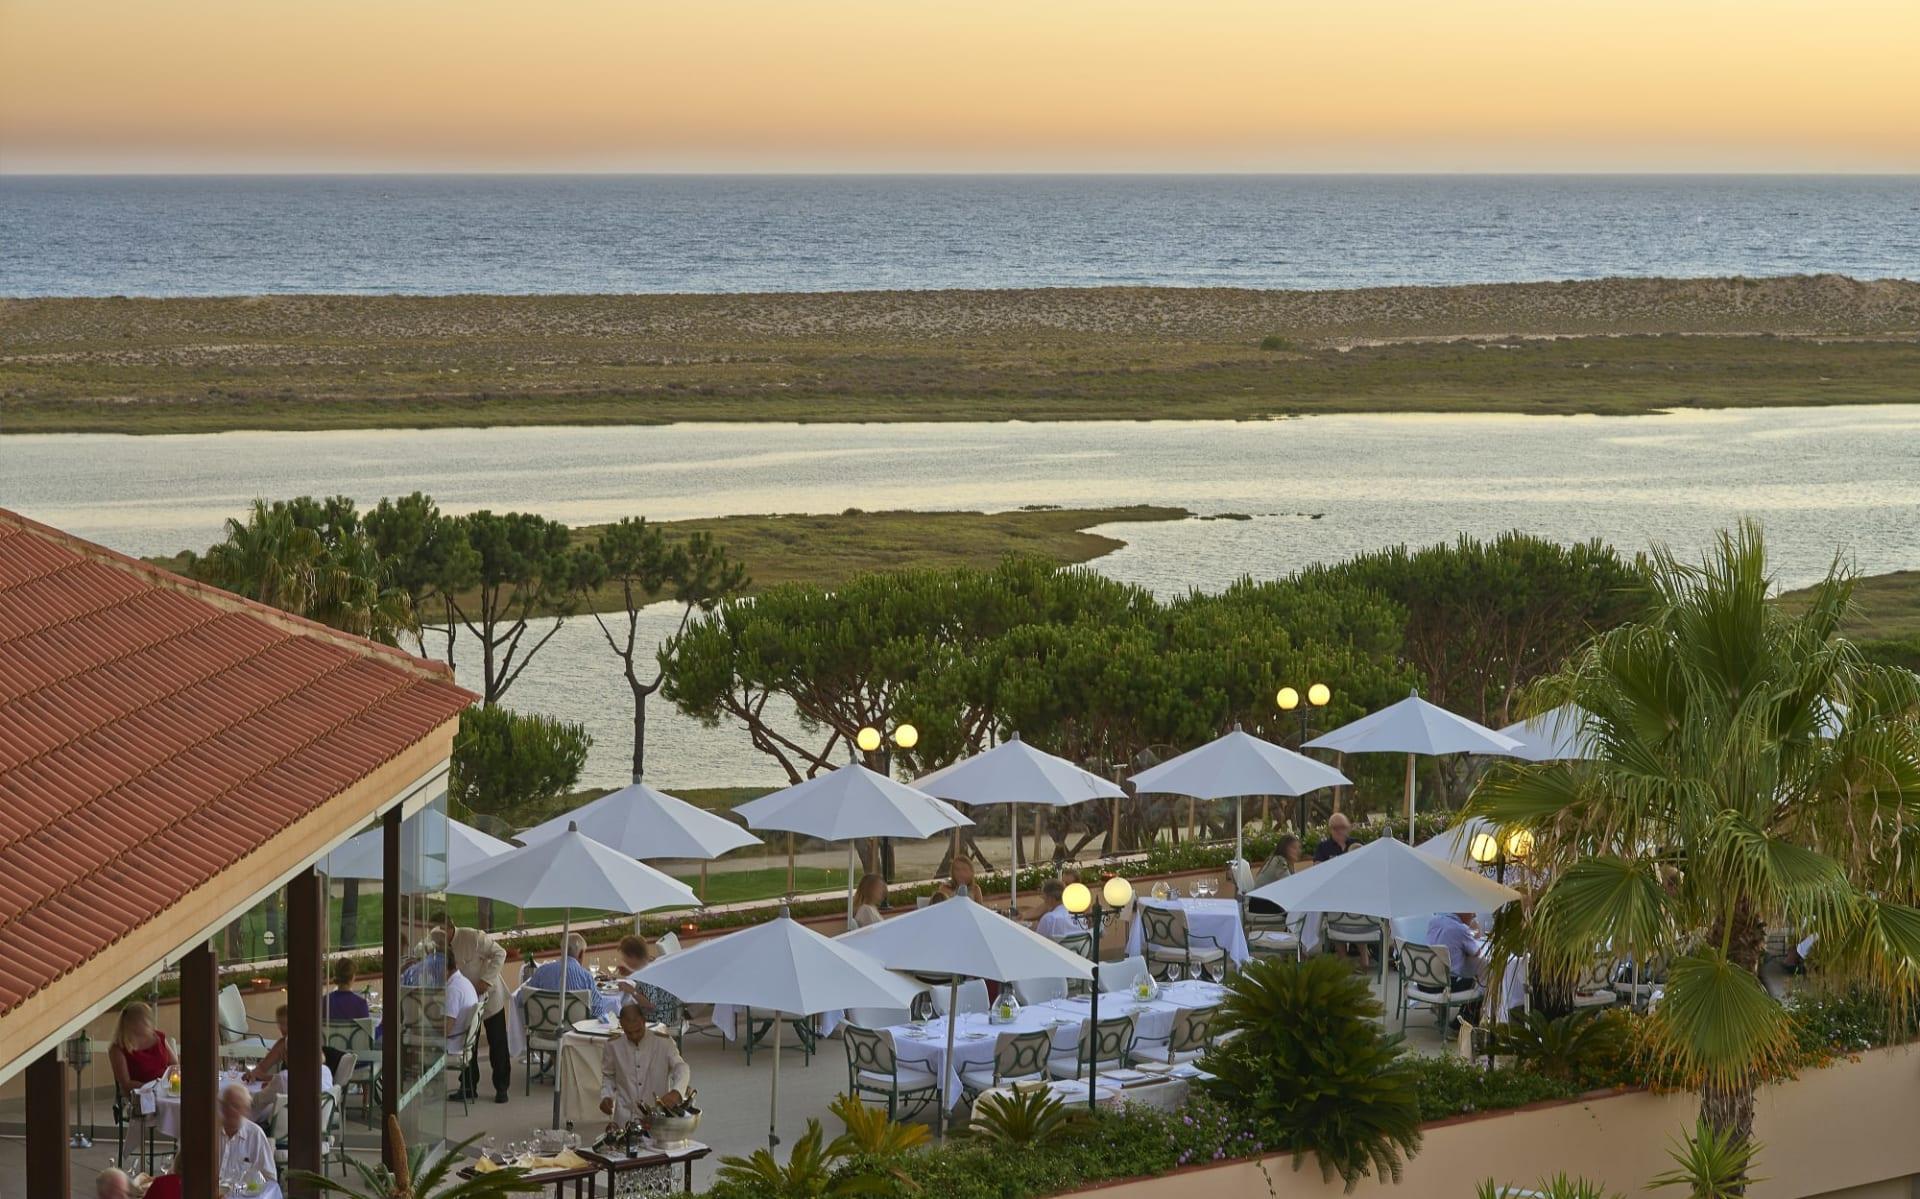 Quinta do Lago in Almancil:  Quinta do Lago - Restaurant Briso do Mar Terrasse